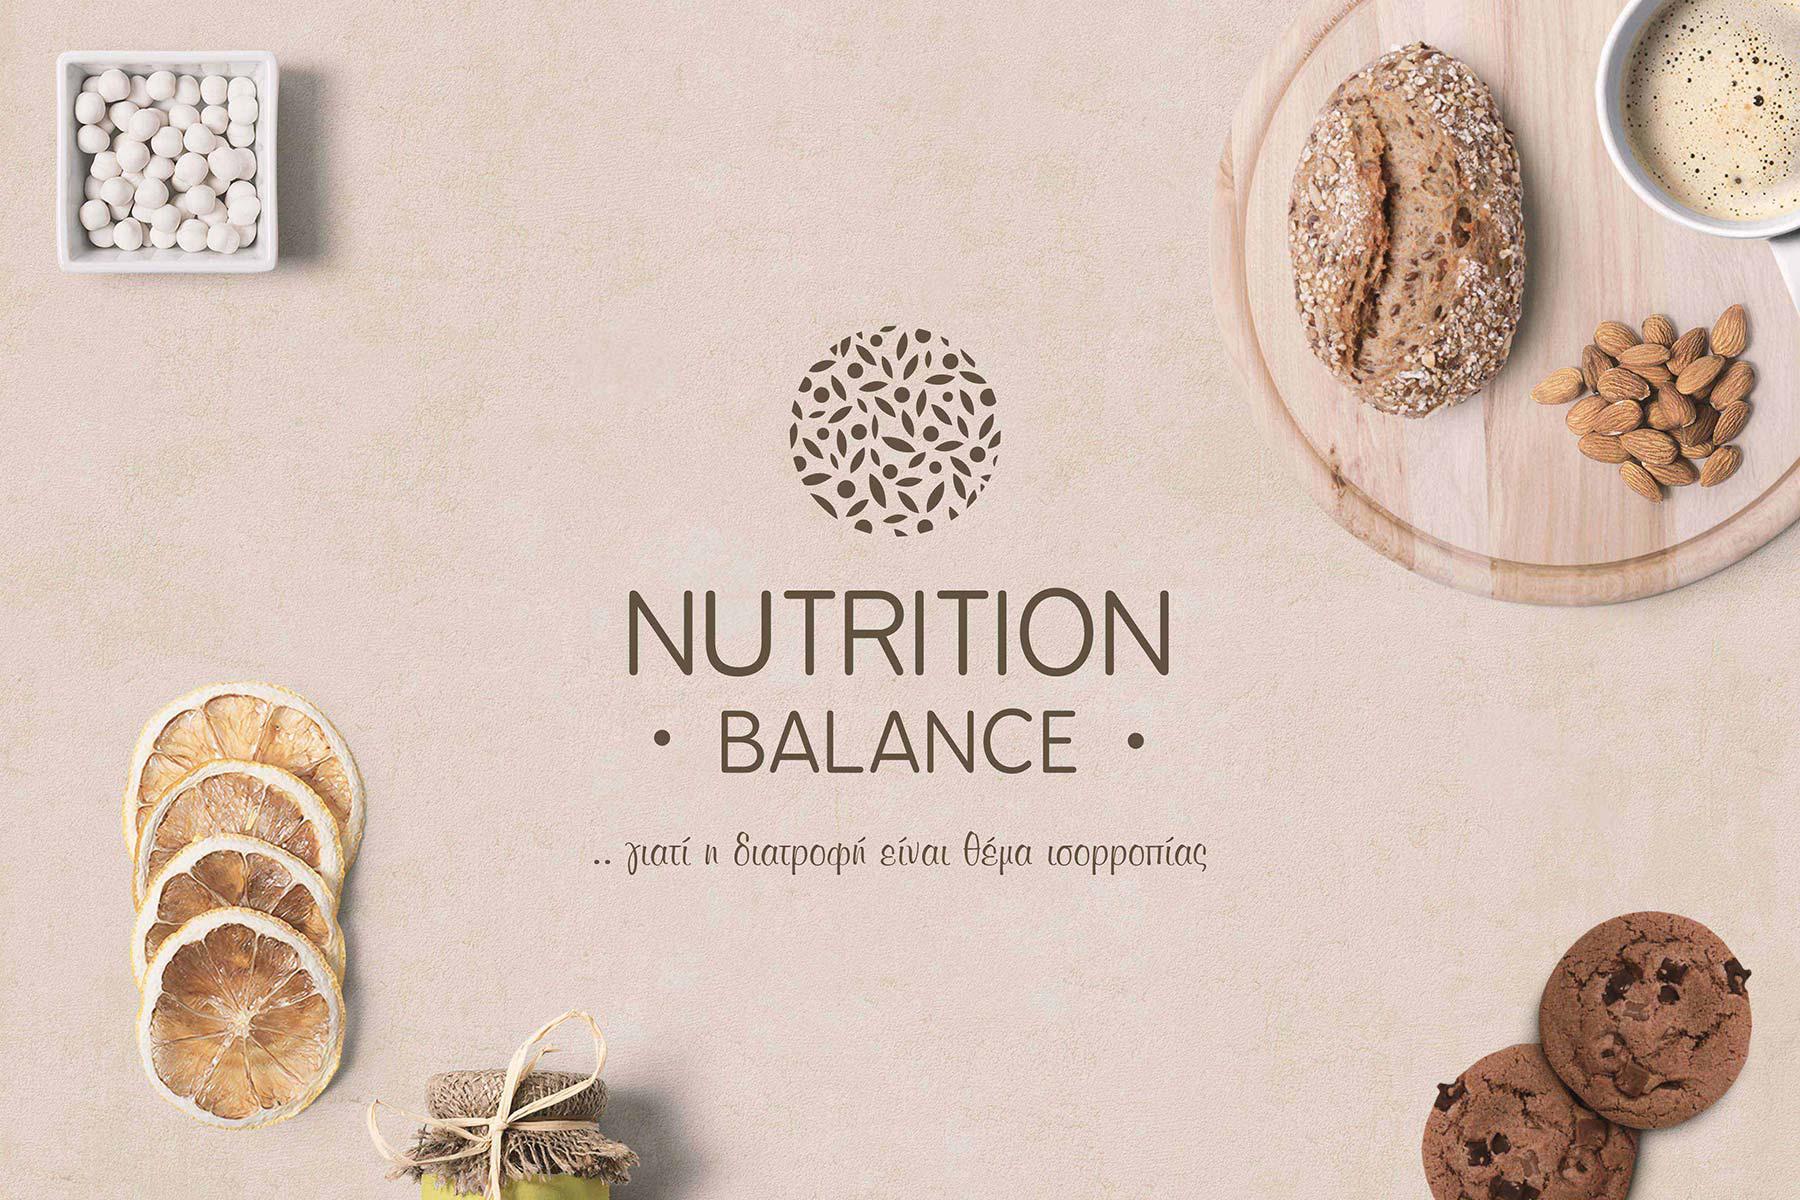 Nutrition Balance Branding